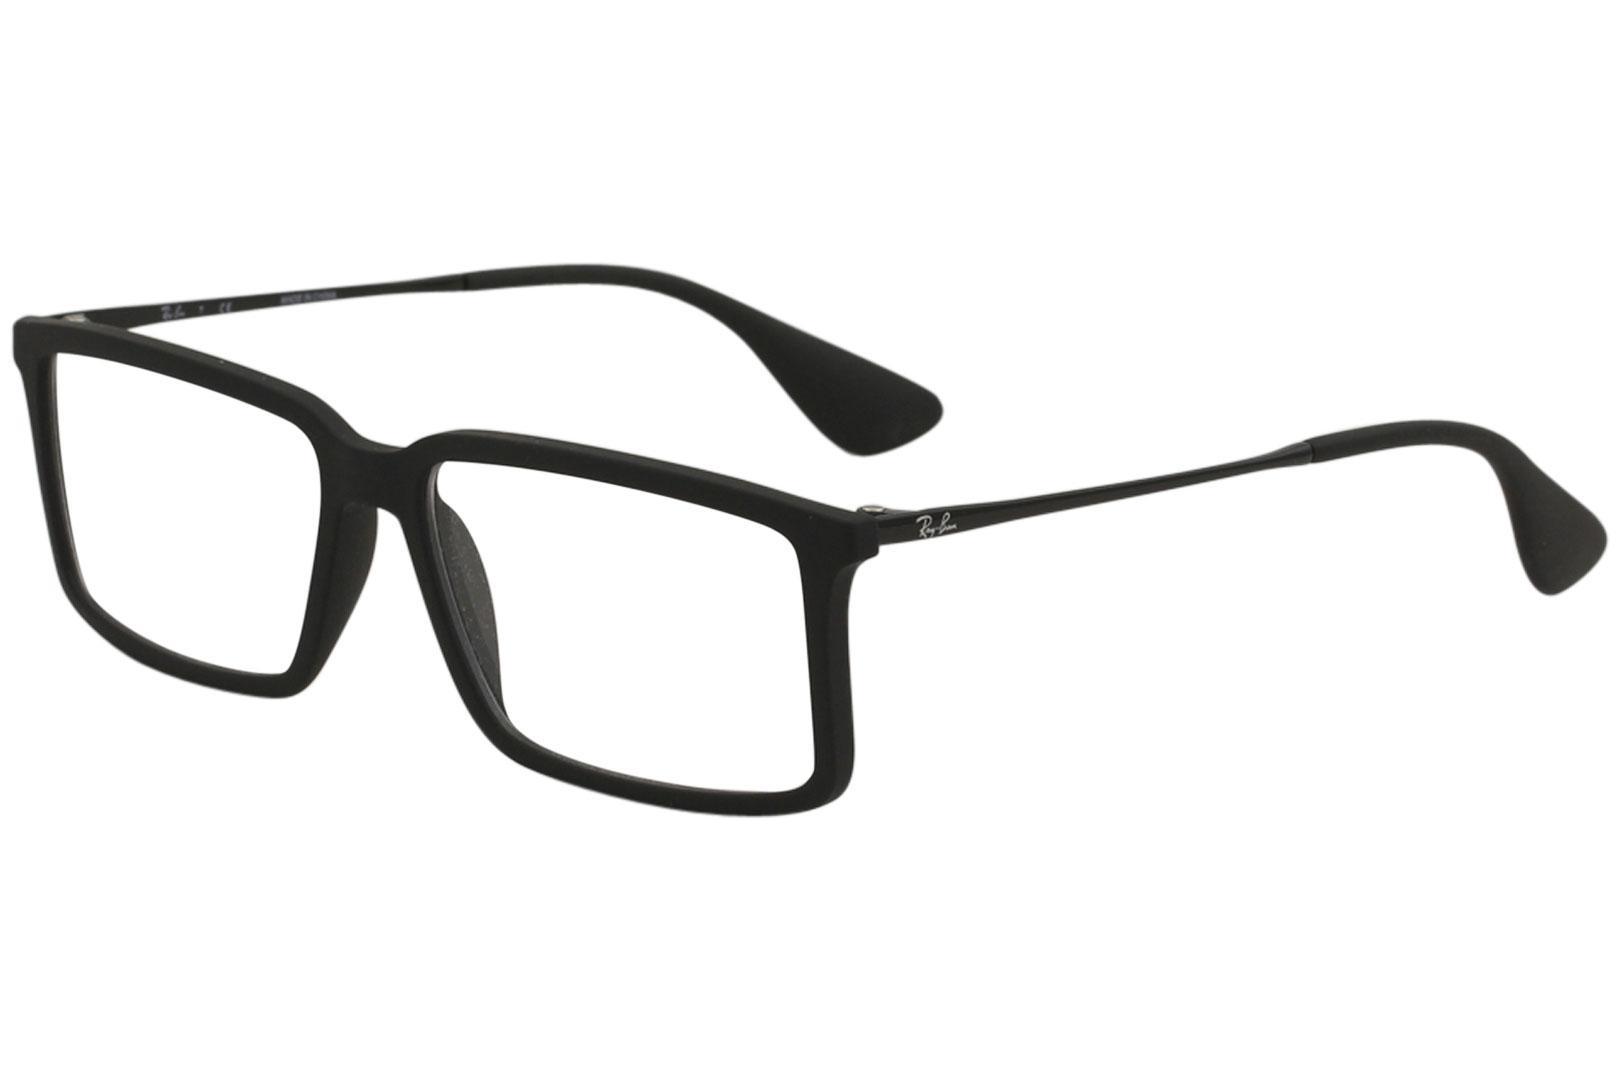 4bacd80382f Ray Ban Eyeglasses RX7043 RX 7043 RayBan 5364 Black Rubber Optical ...